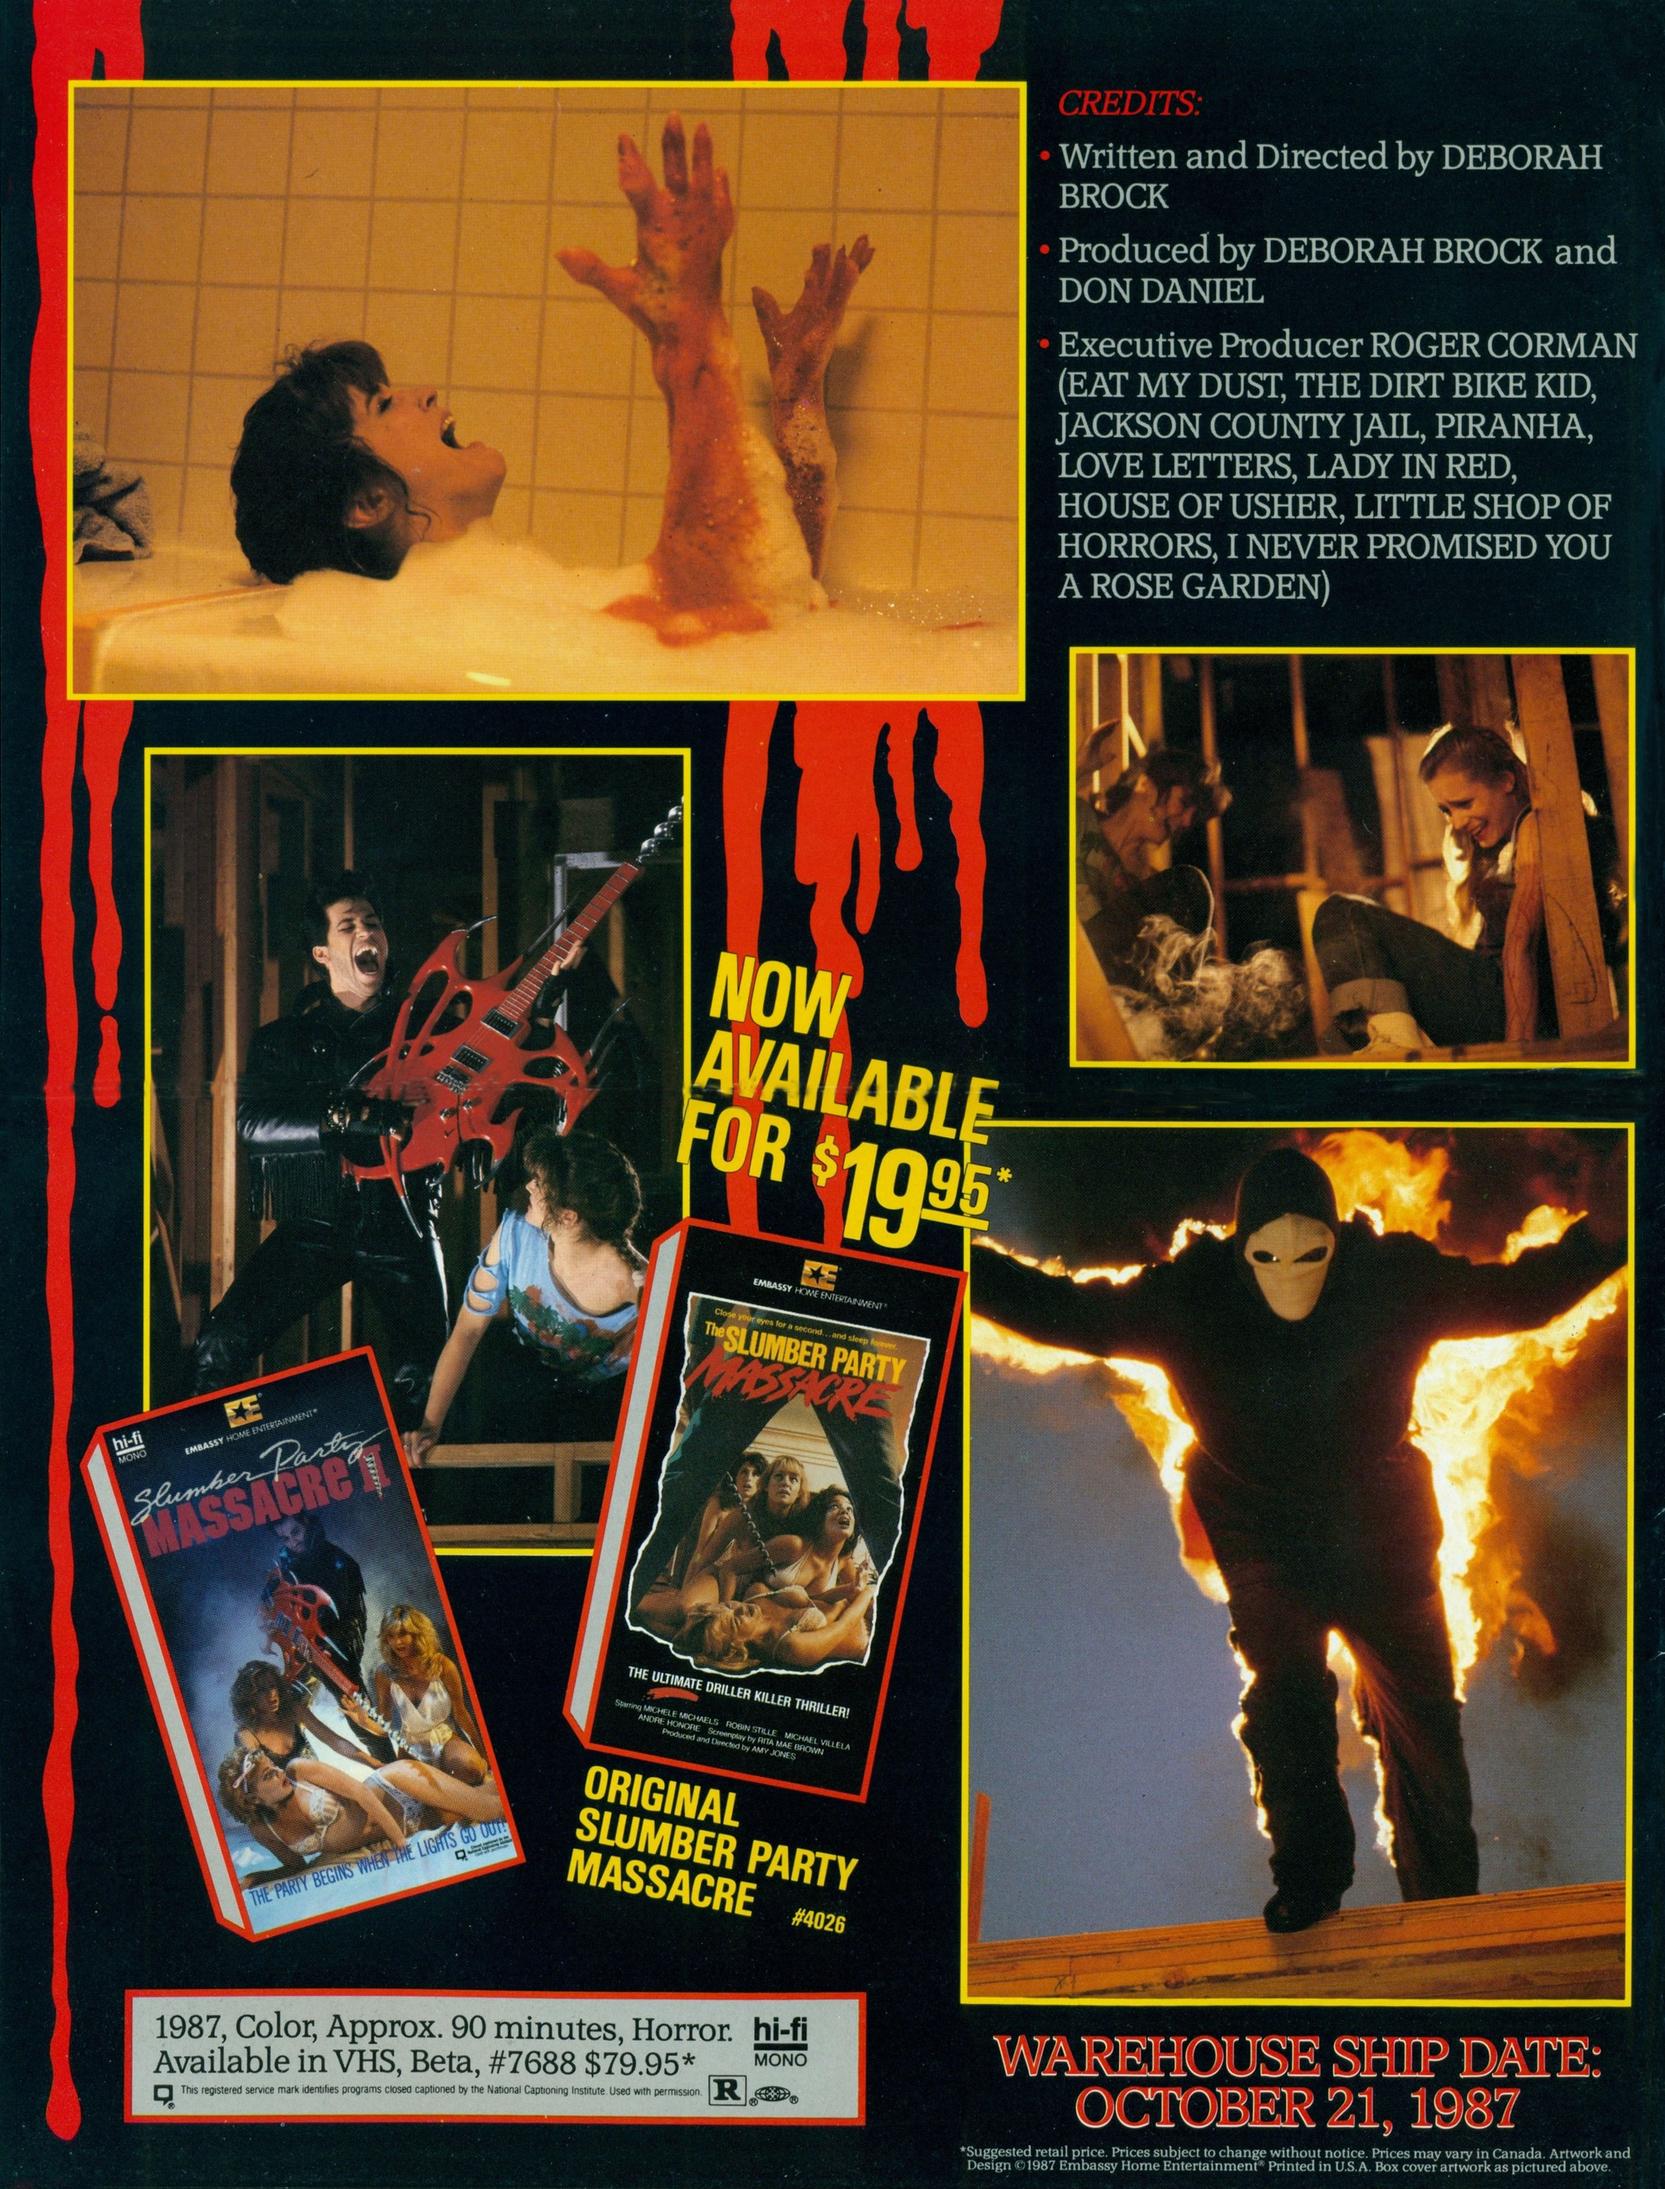 Slumber Party Massacre II VHS ad